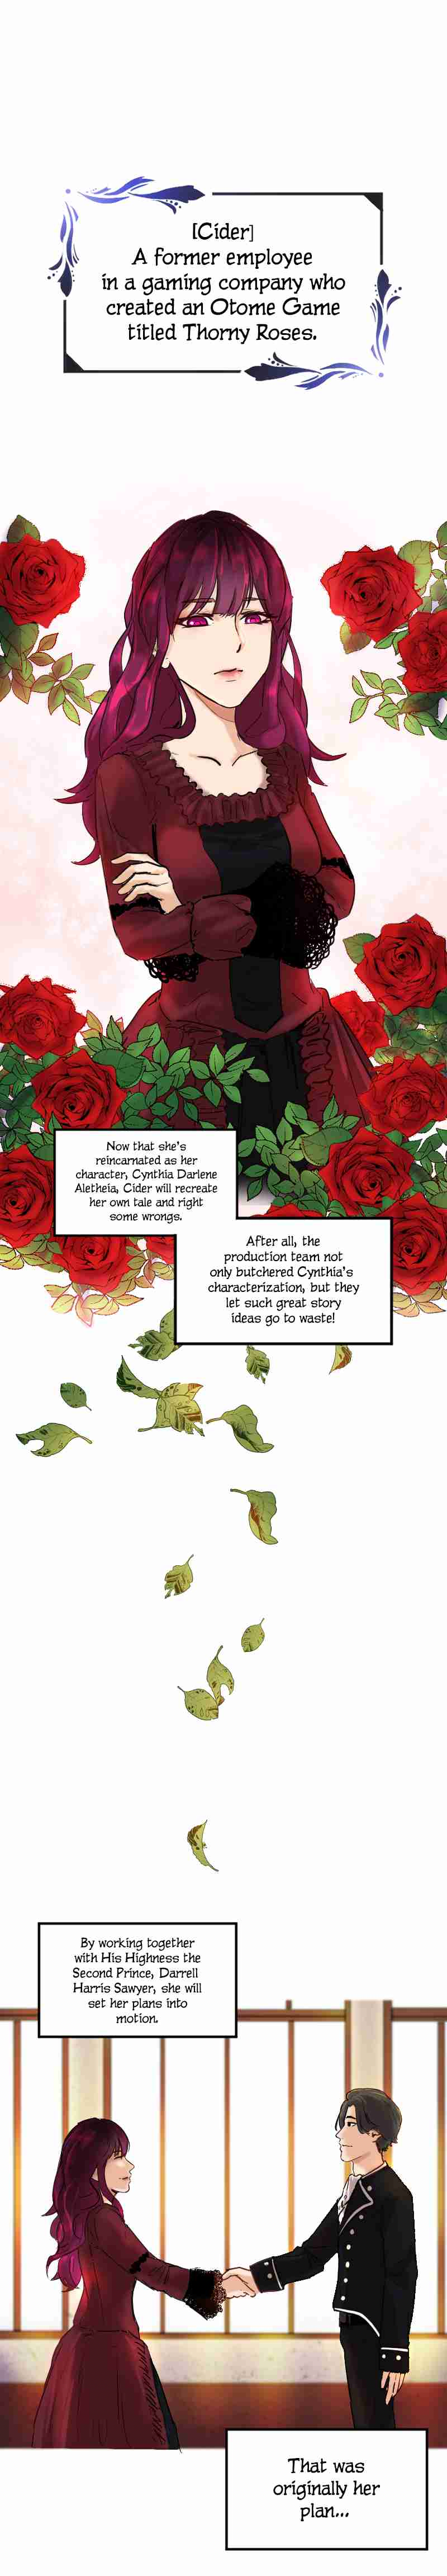 https://img2.nineanime.com/comics/pic4/9/40393/1925683/ca0d22d37cb60dc532f77c4fb4d5f5fe.jpg Page 1